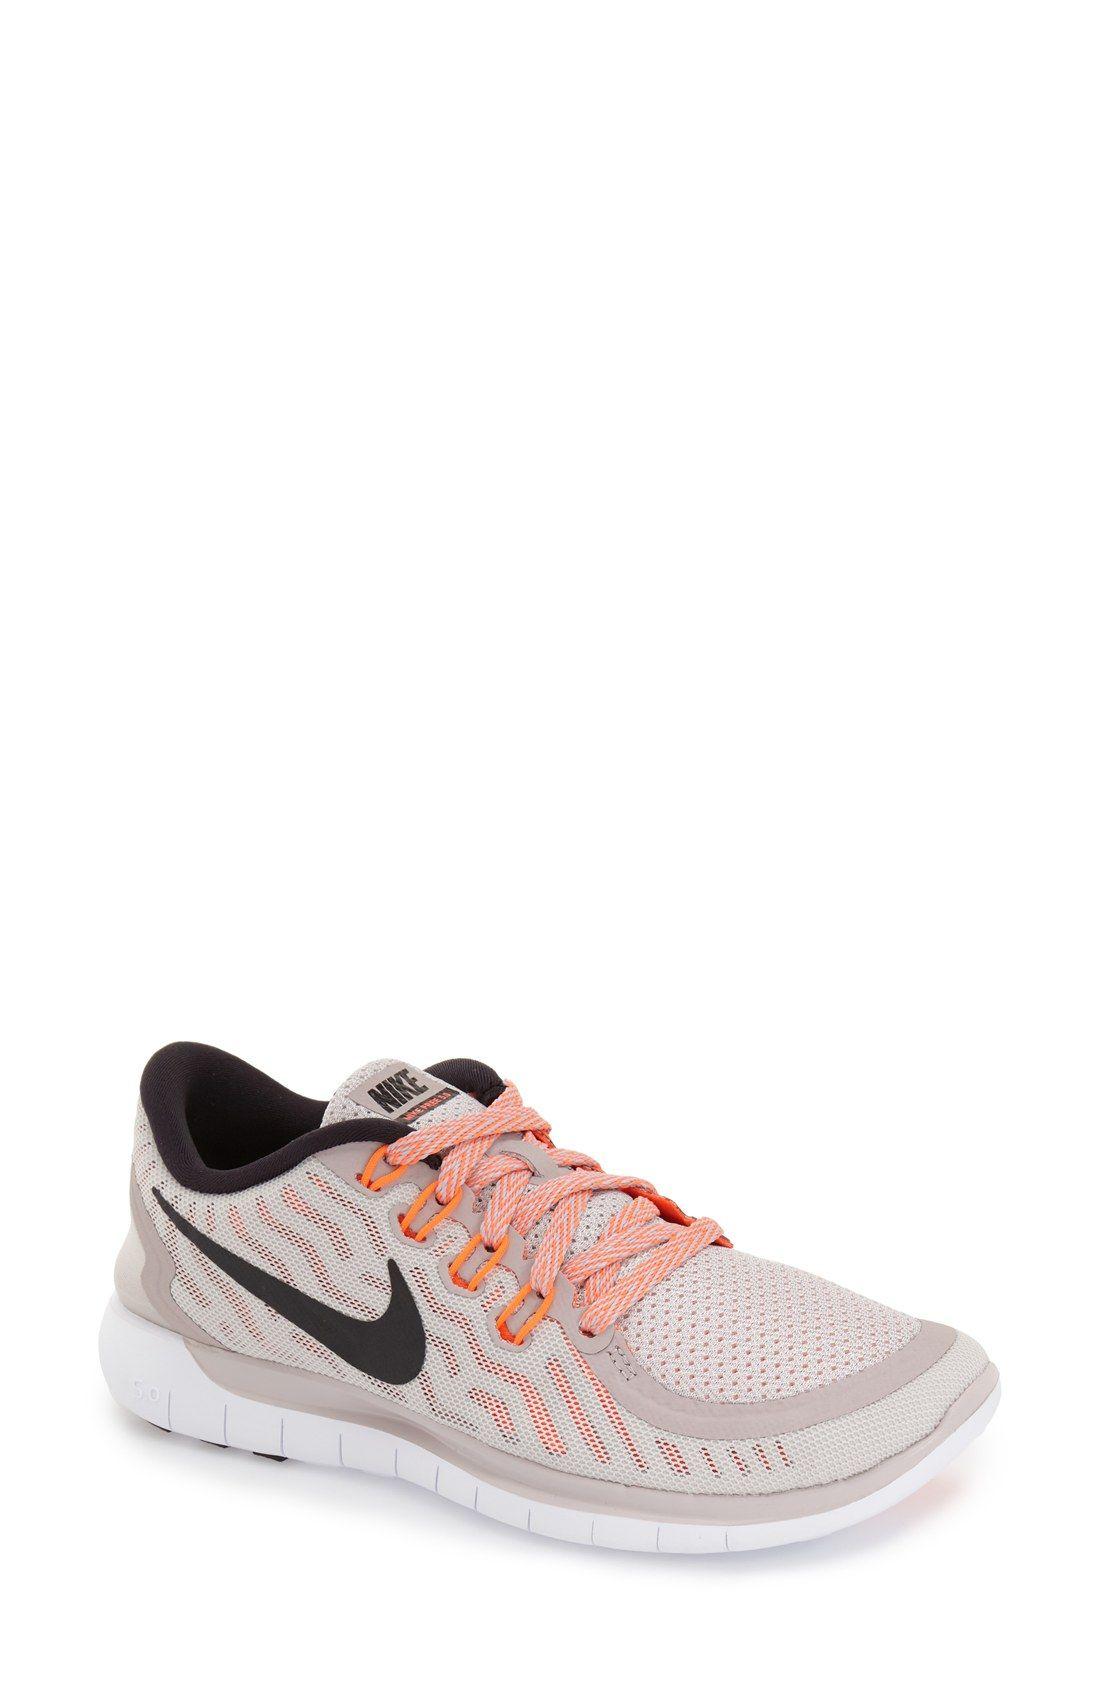 Dam Running Skor Nike Performance FREE 4.0 FLYKNIT Trainers